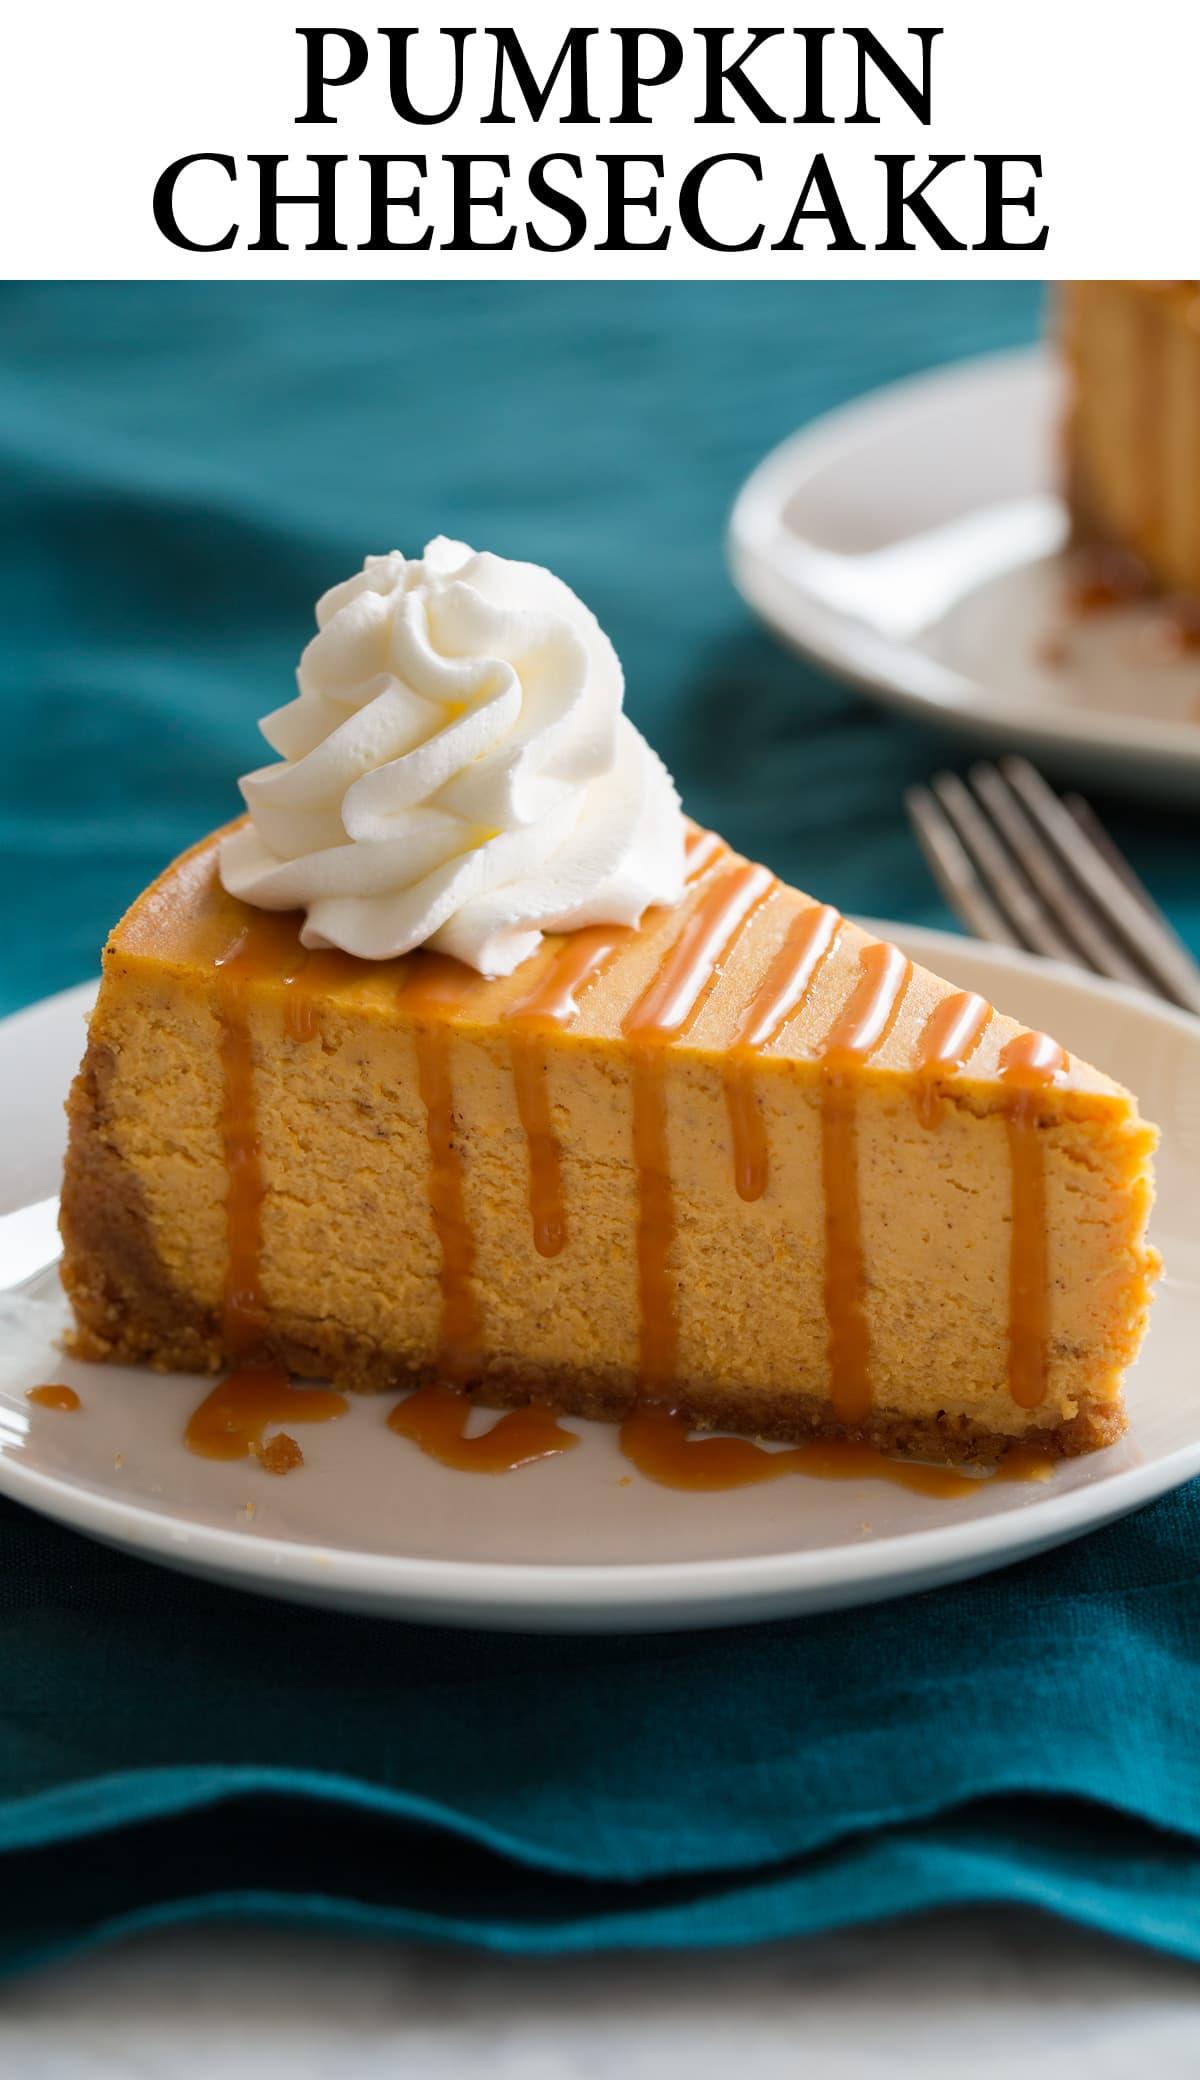 Pumpkin Cheesecake Recipe Cooking Classy